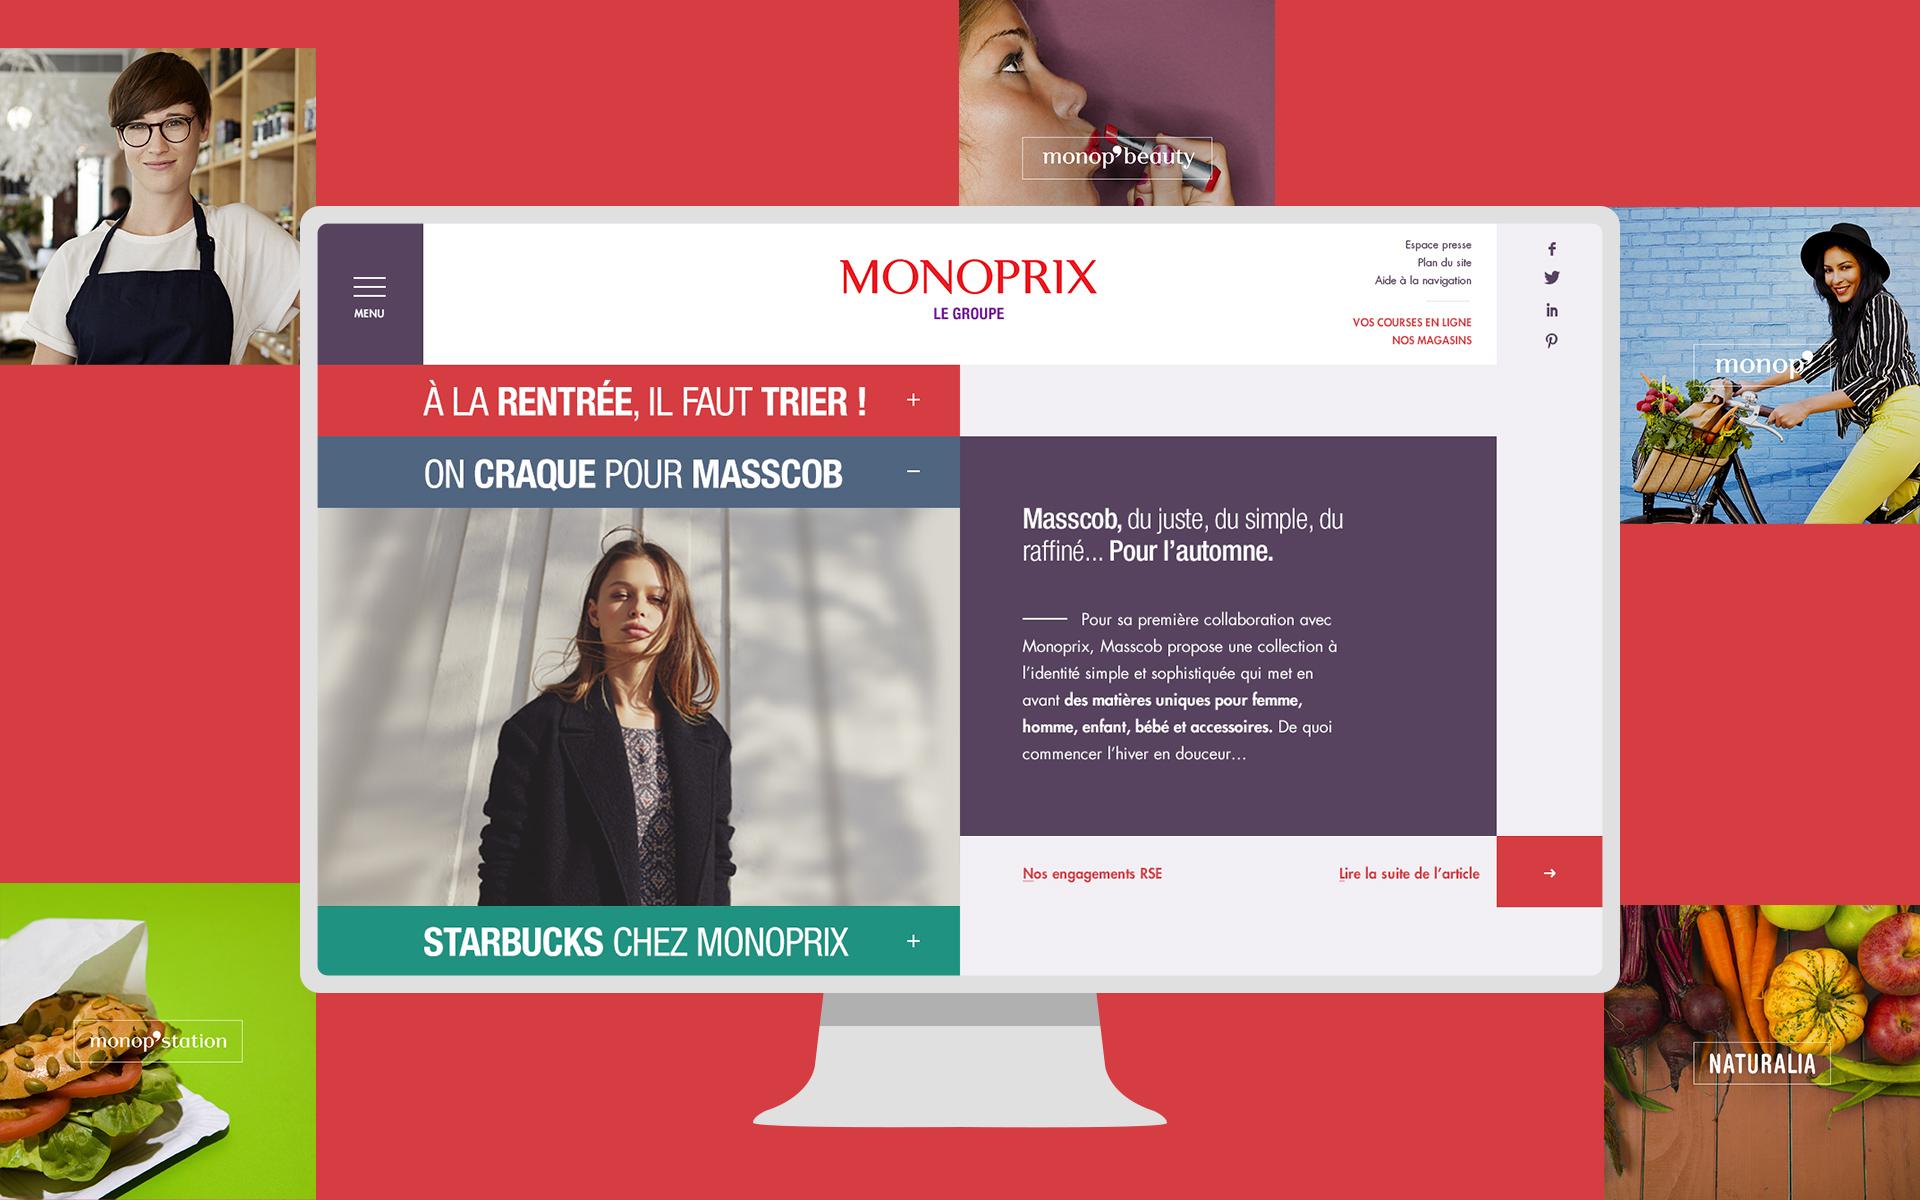 Monoprix_KV01_1920x1200_01